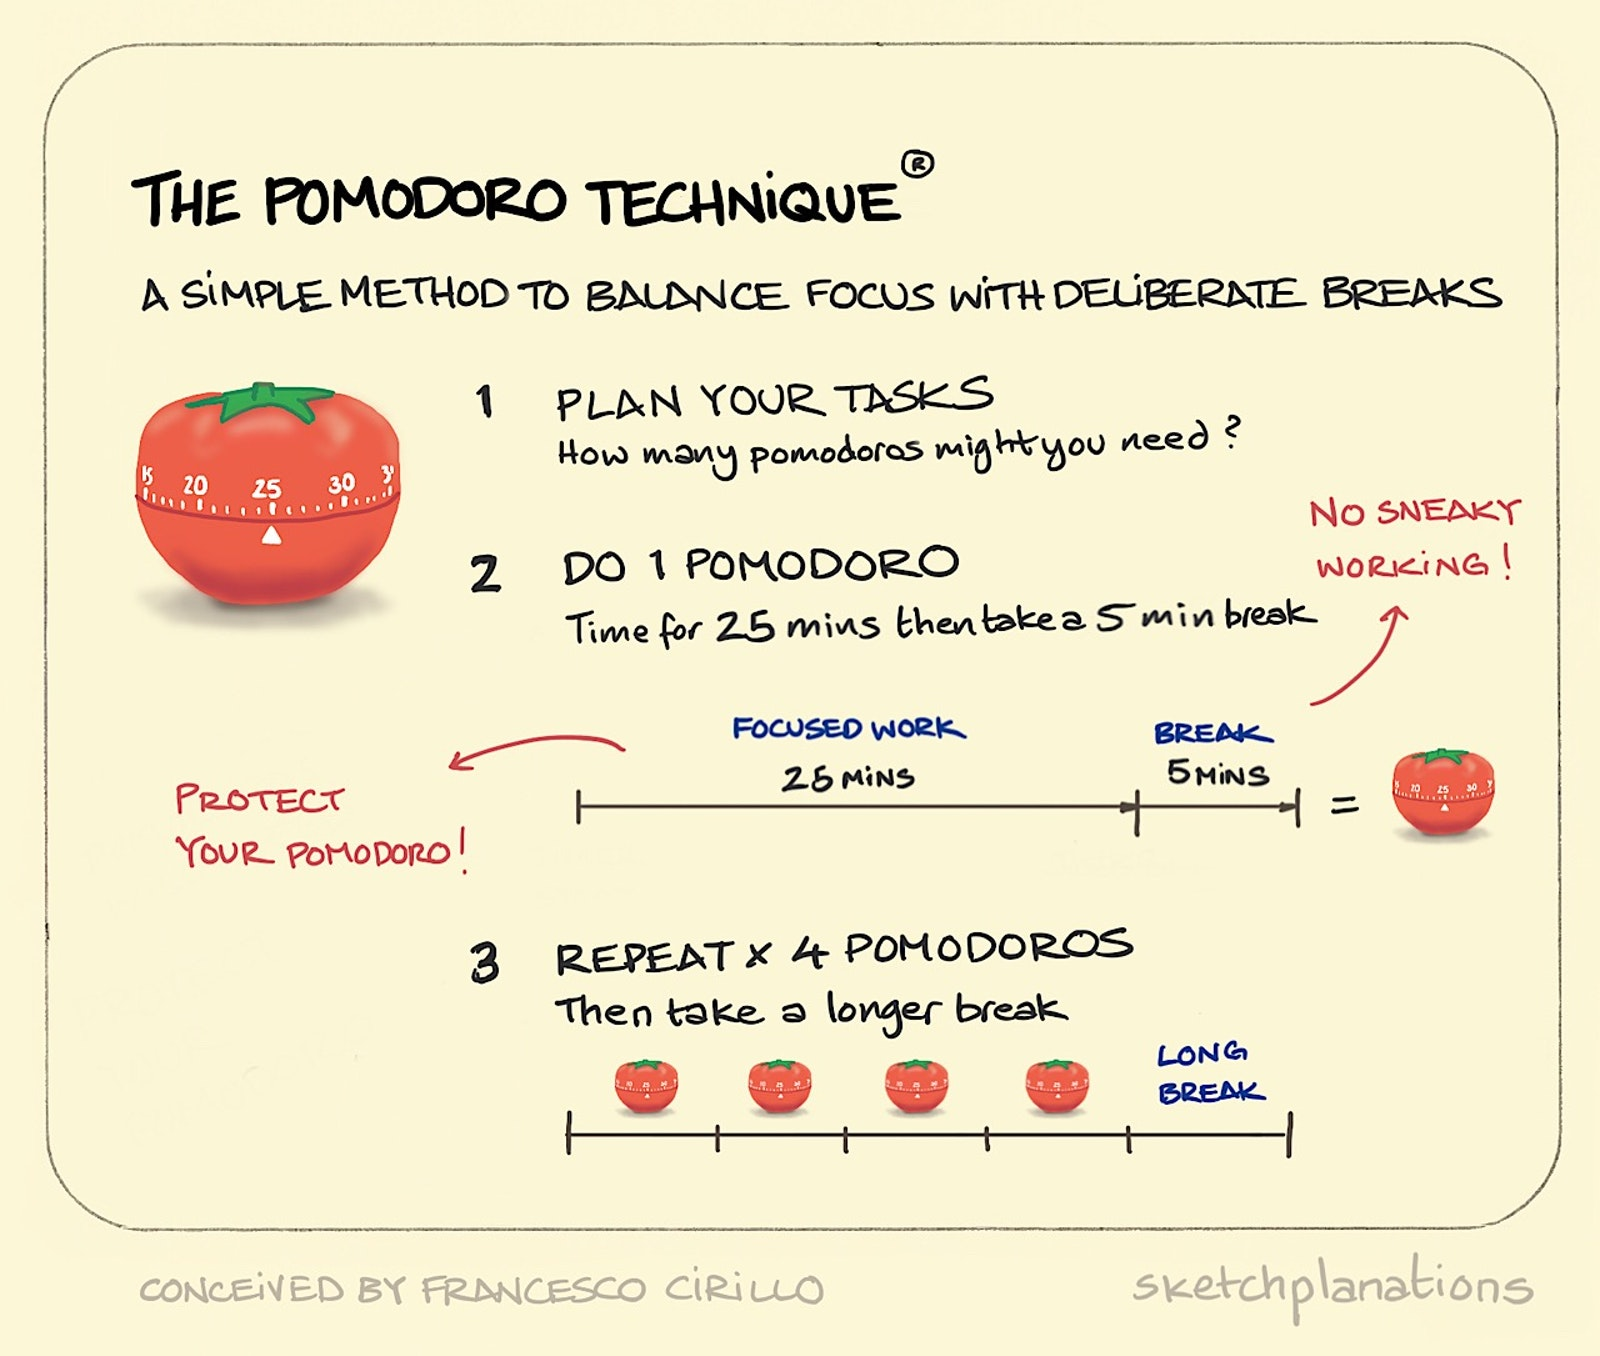 The Pomodoro Technique ® - Sketchplanations